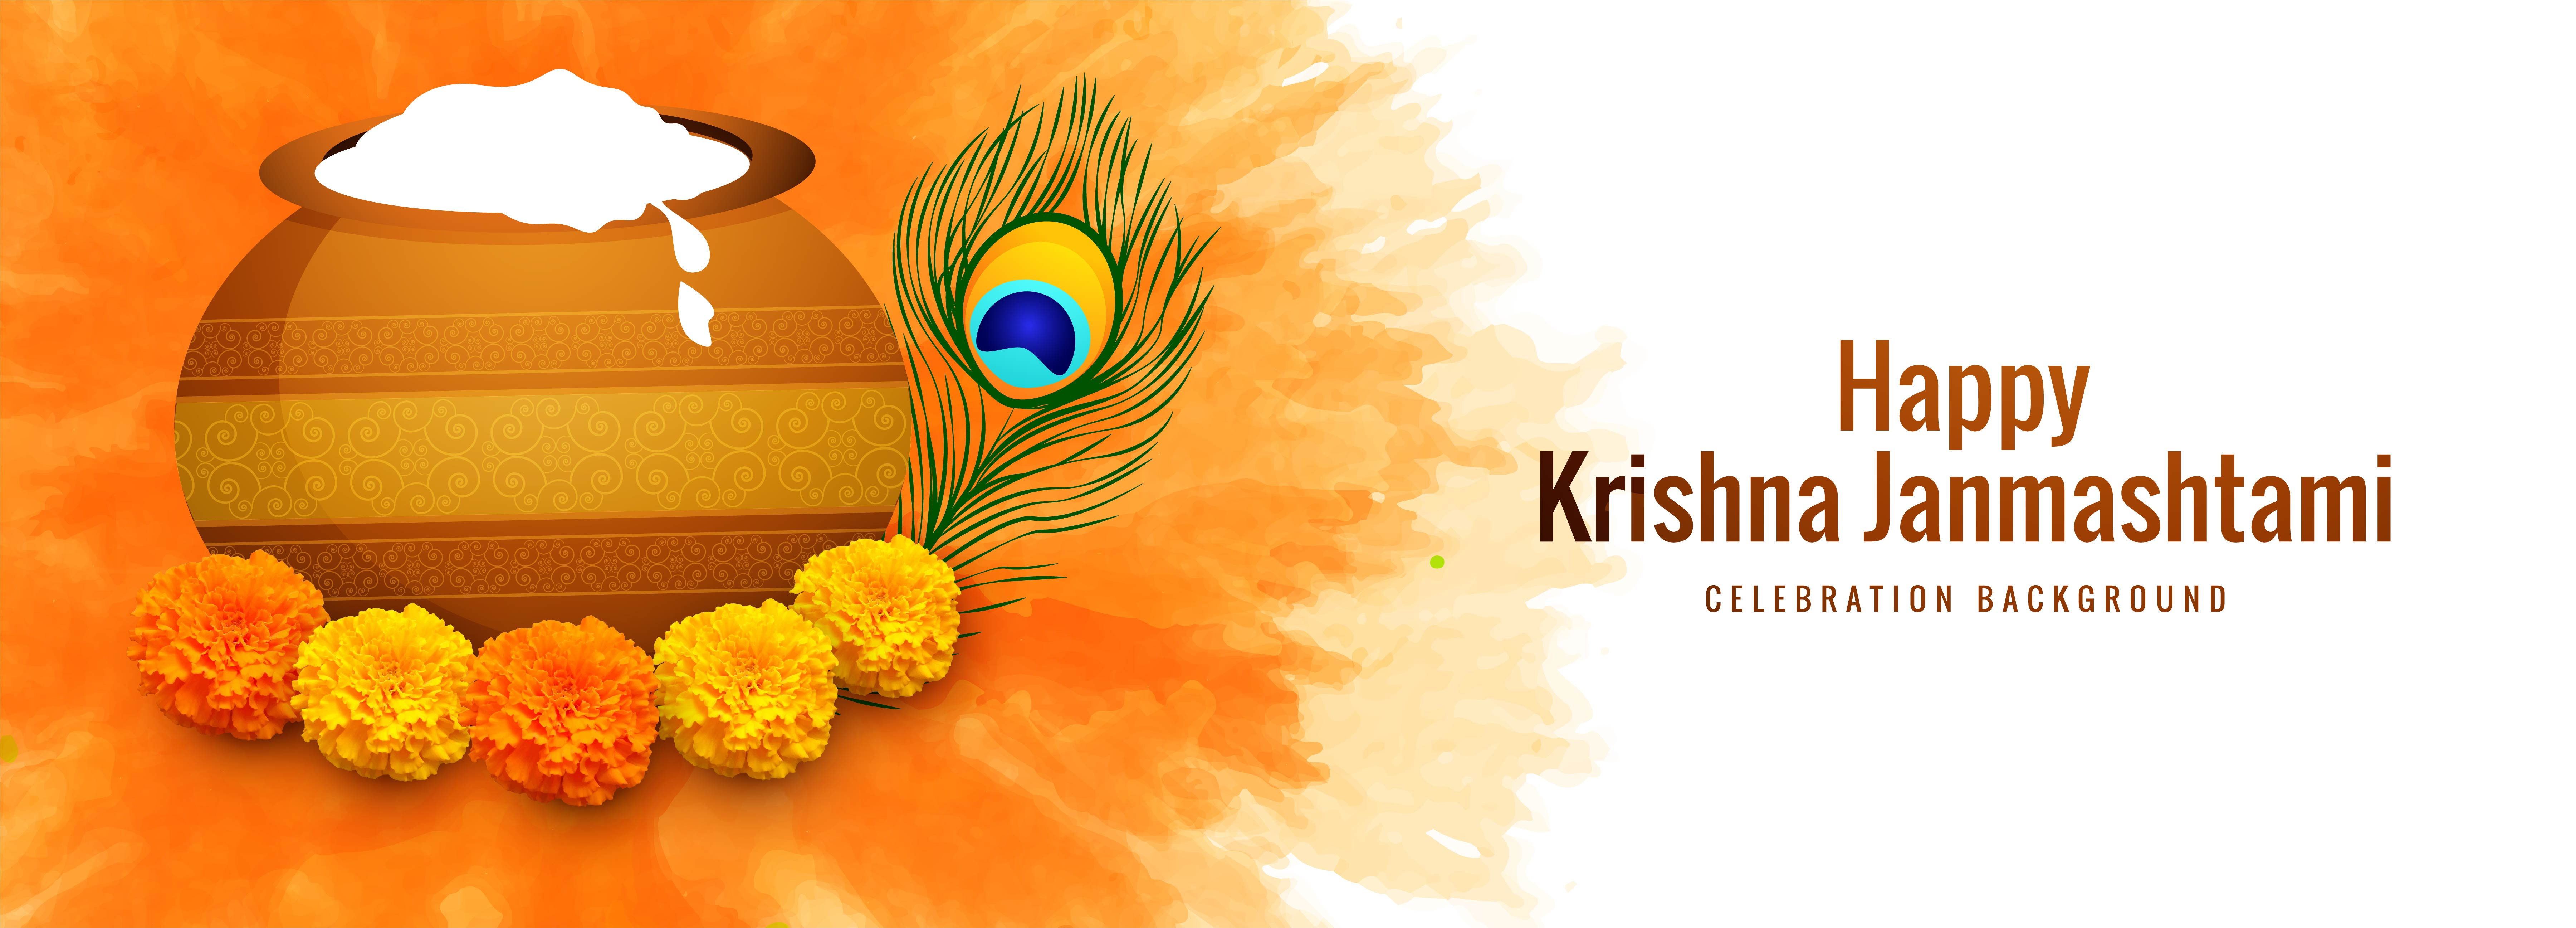 feliz celebración janmashtami tarjeta religiosa banner